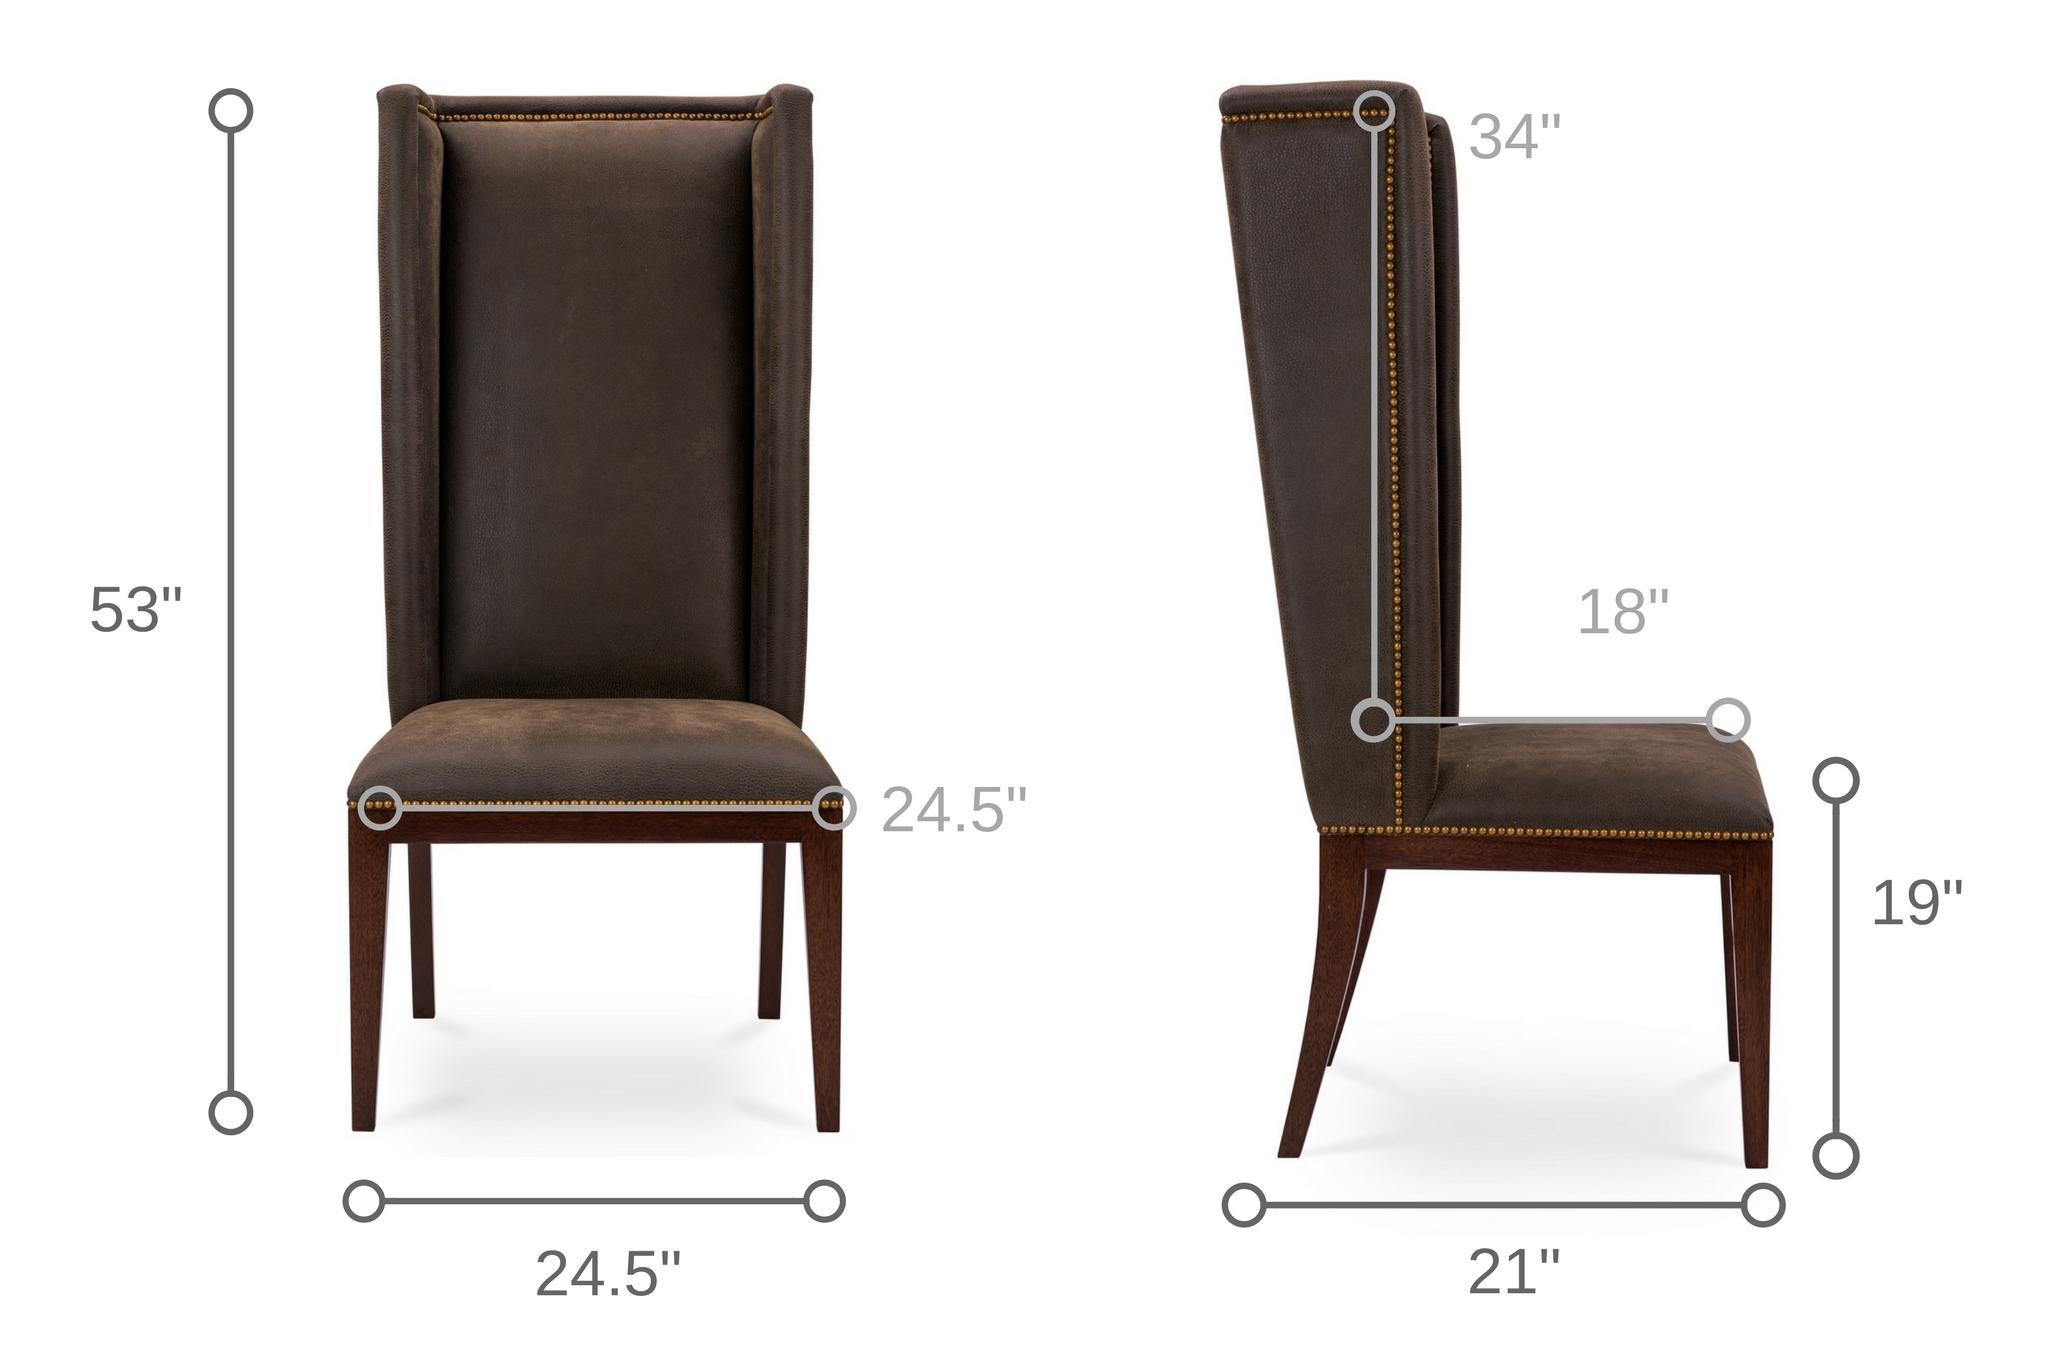 Dowel Furniture Maria Host Chair Dimensions